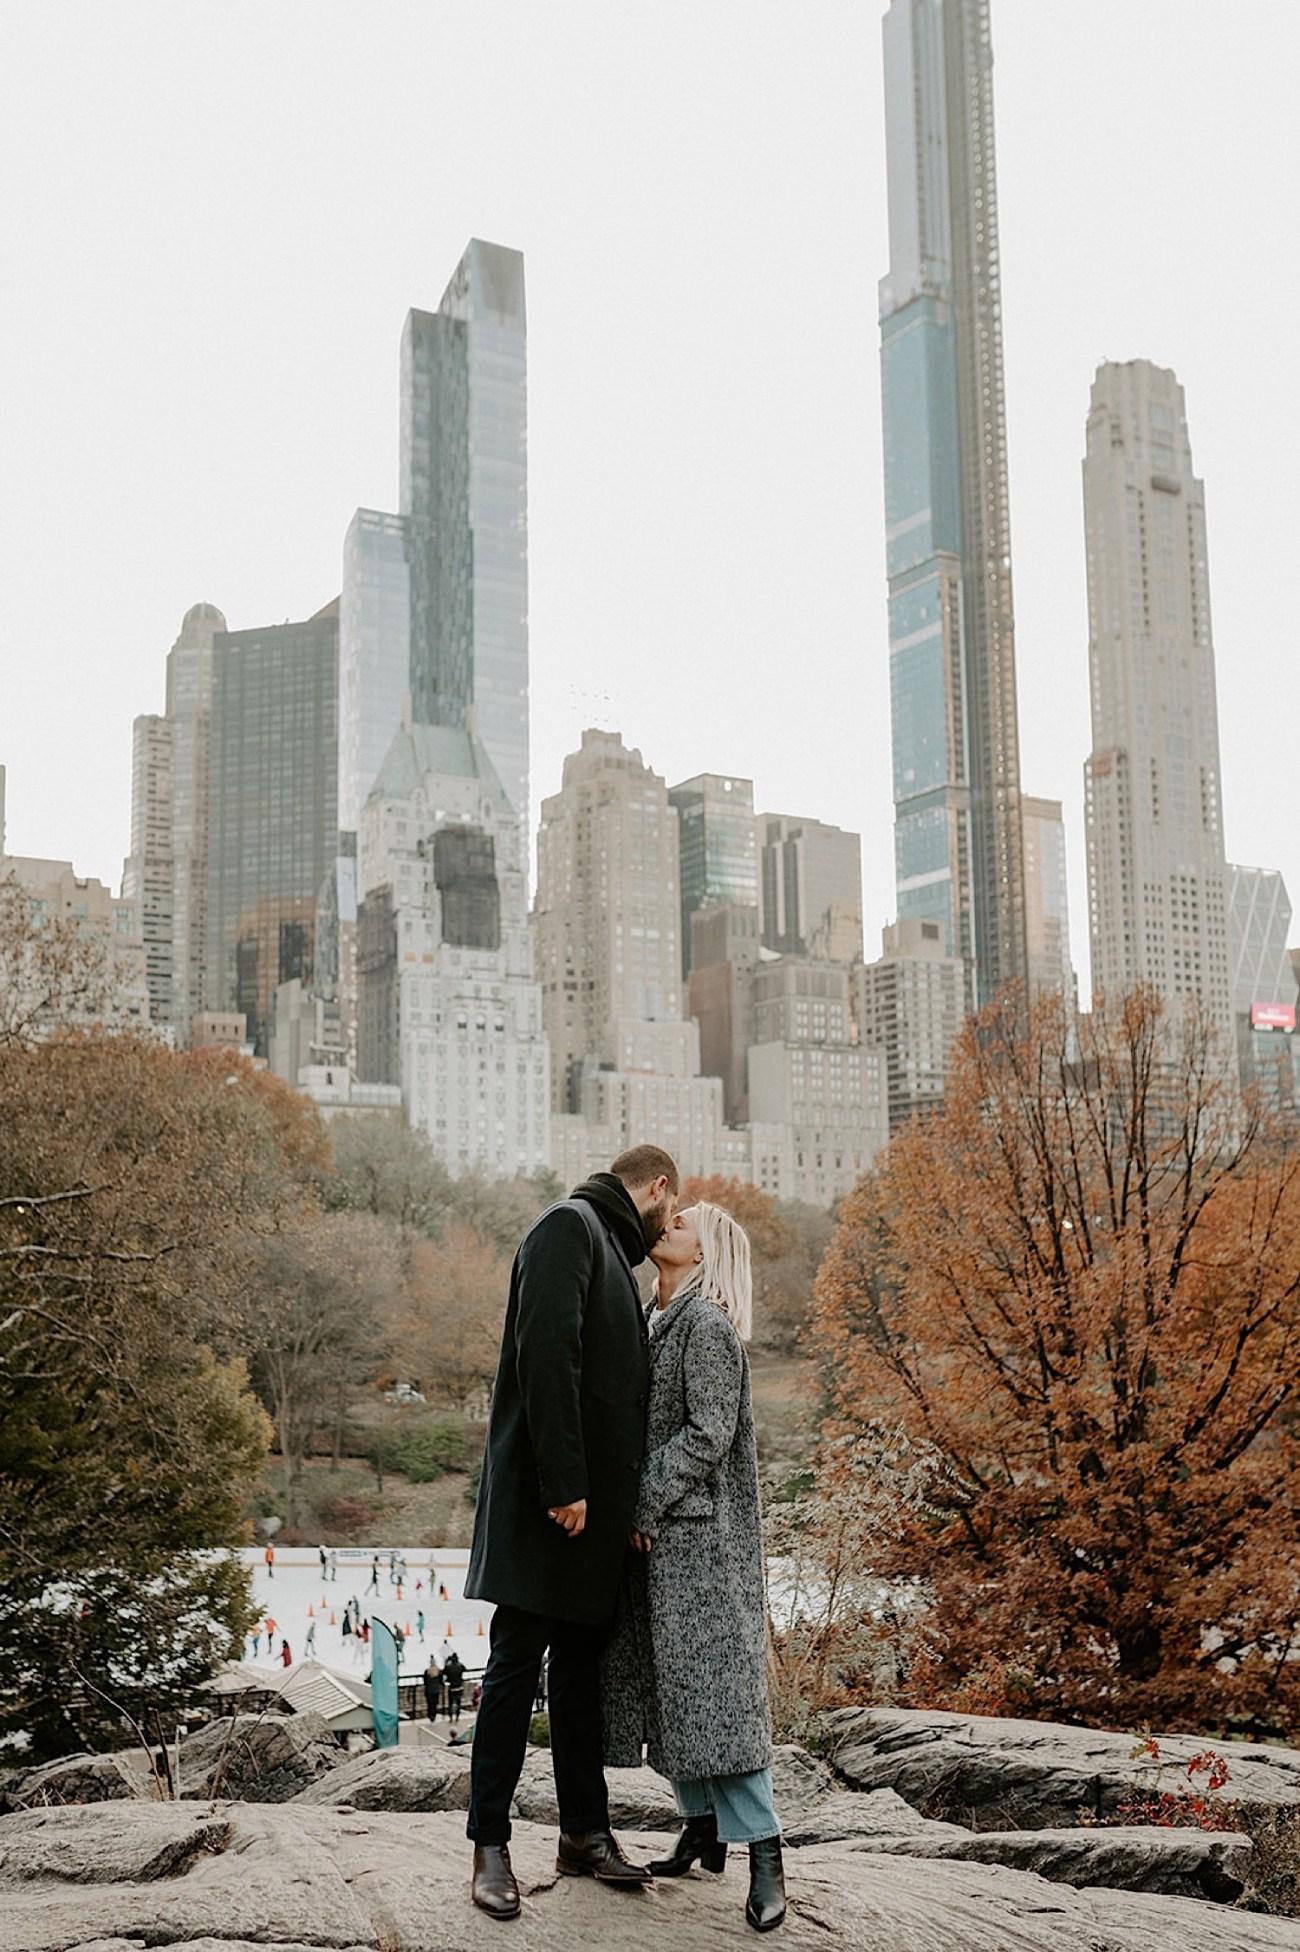 095 Central Park Enagement Photos Bethesda Terrace Engagement Photos New York Wedding Photographer